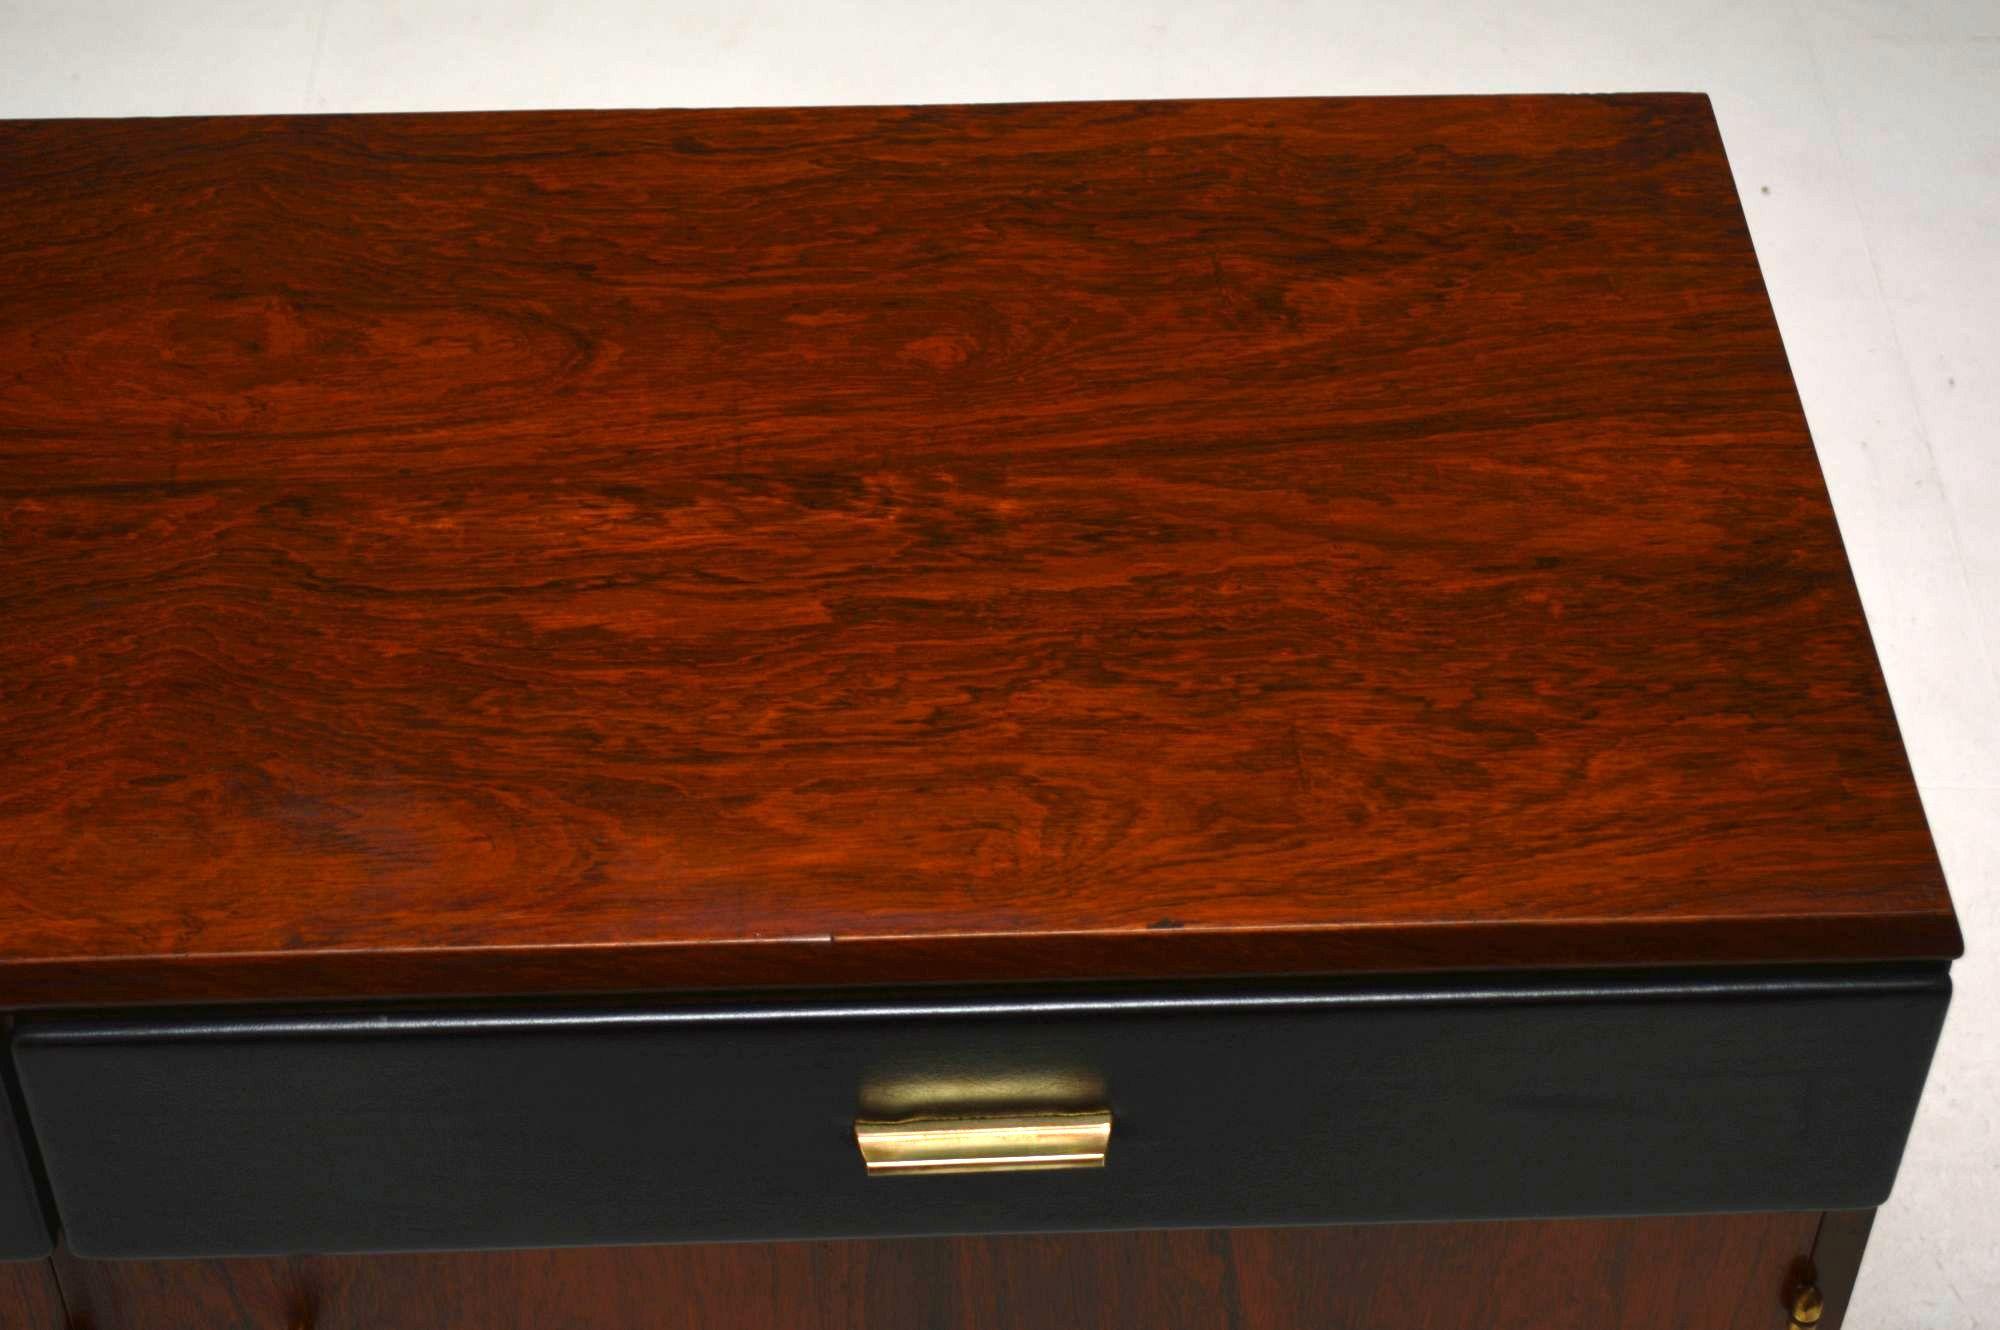 Retro Rosewood Sideboard By Beresford Amp Hicks Vintage 1960